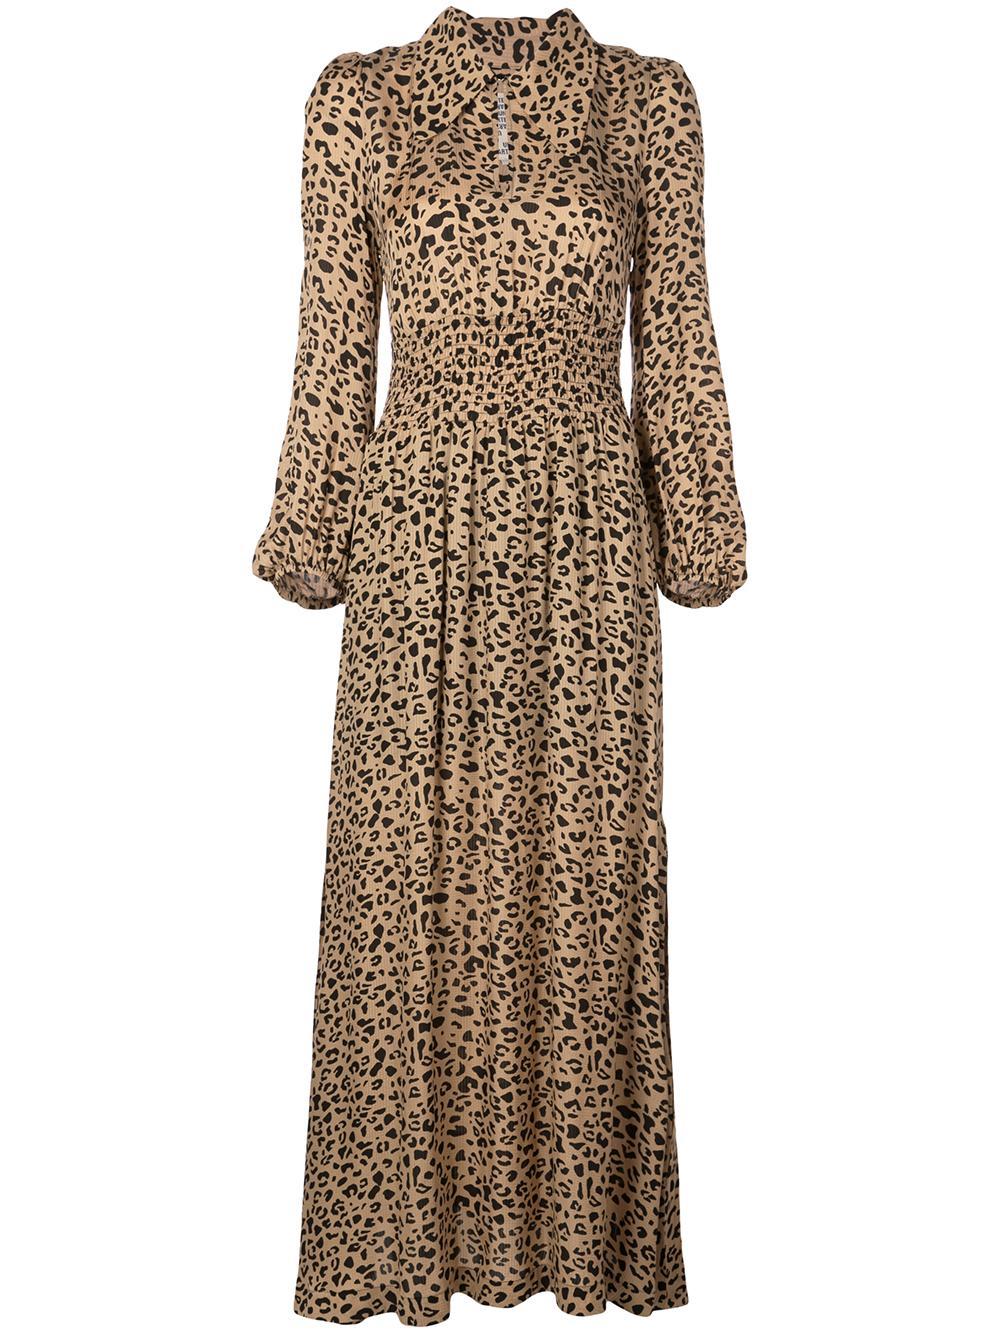 Amber Leopard Smoked Waist Maxi Dress Item # 20499